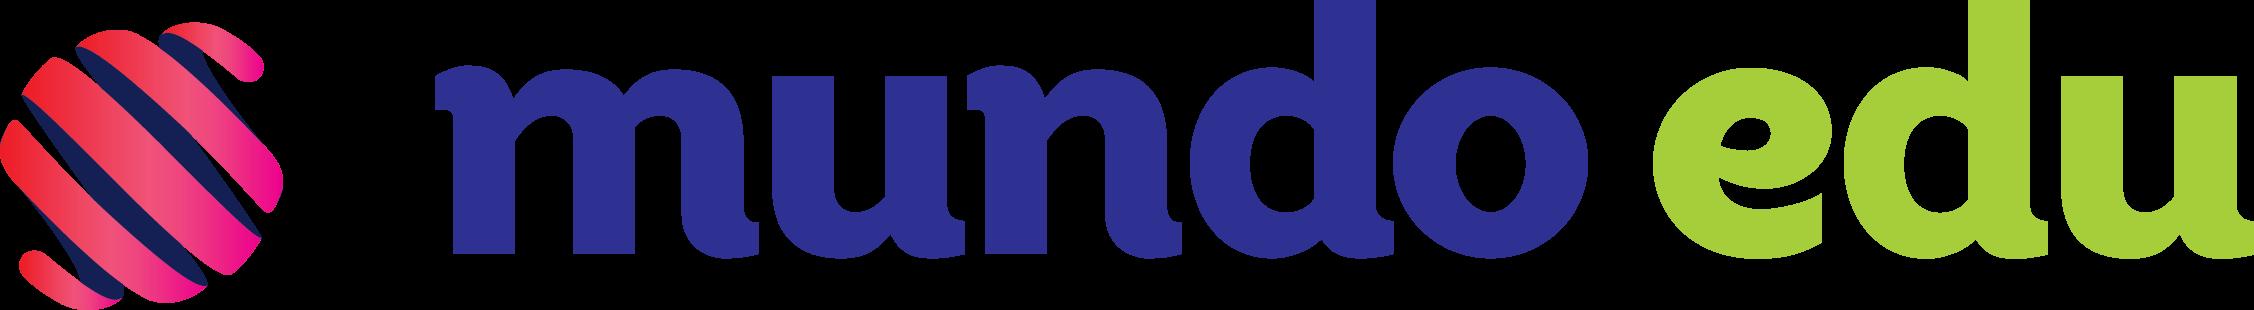 Logo Mundo Edu png